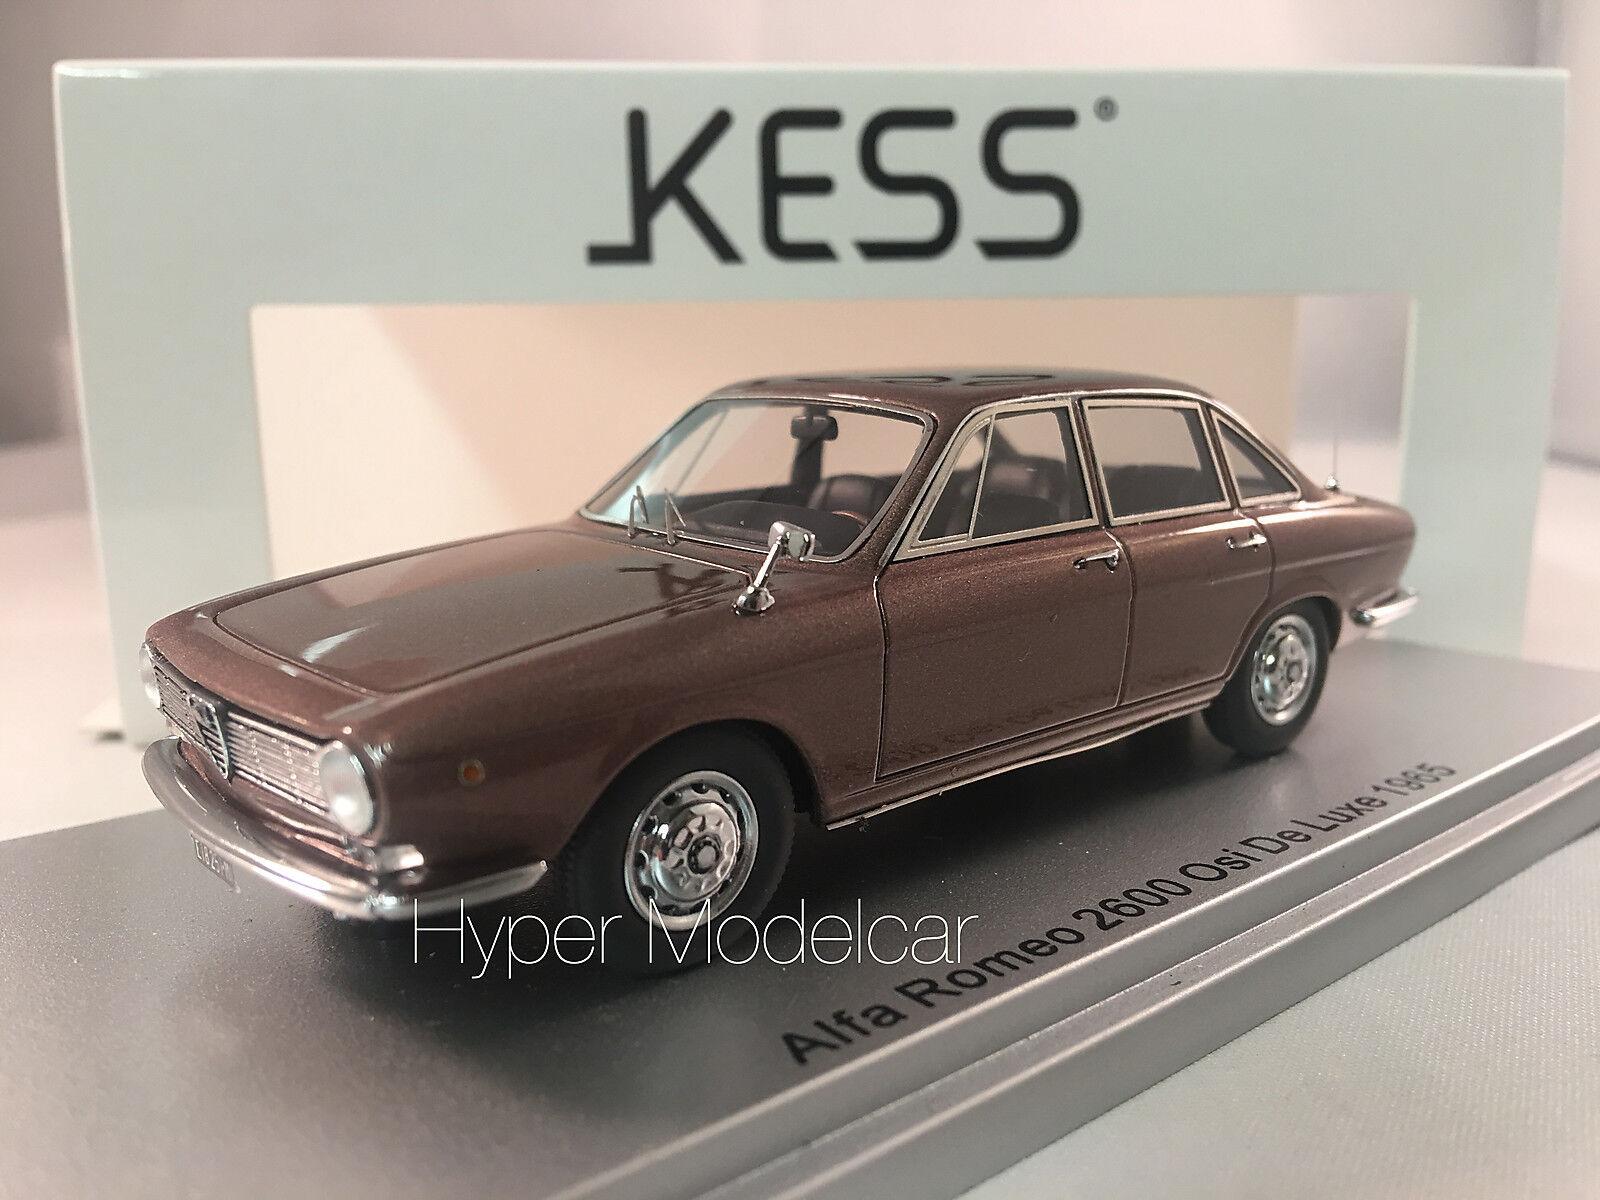 KESS MODEL 1 43 Alfa Romeo Osi De Luxe 1965 marron  Met. Art. KE43000251